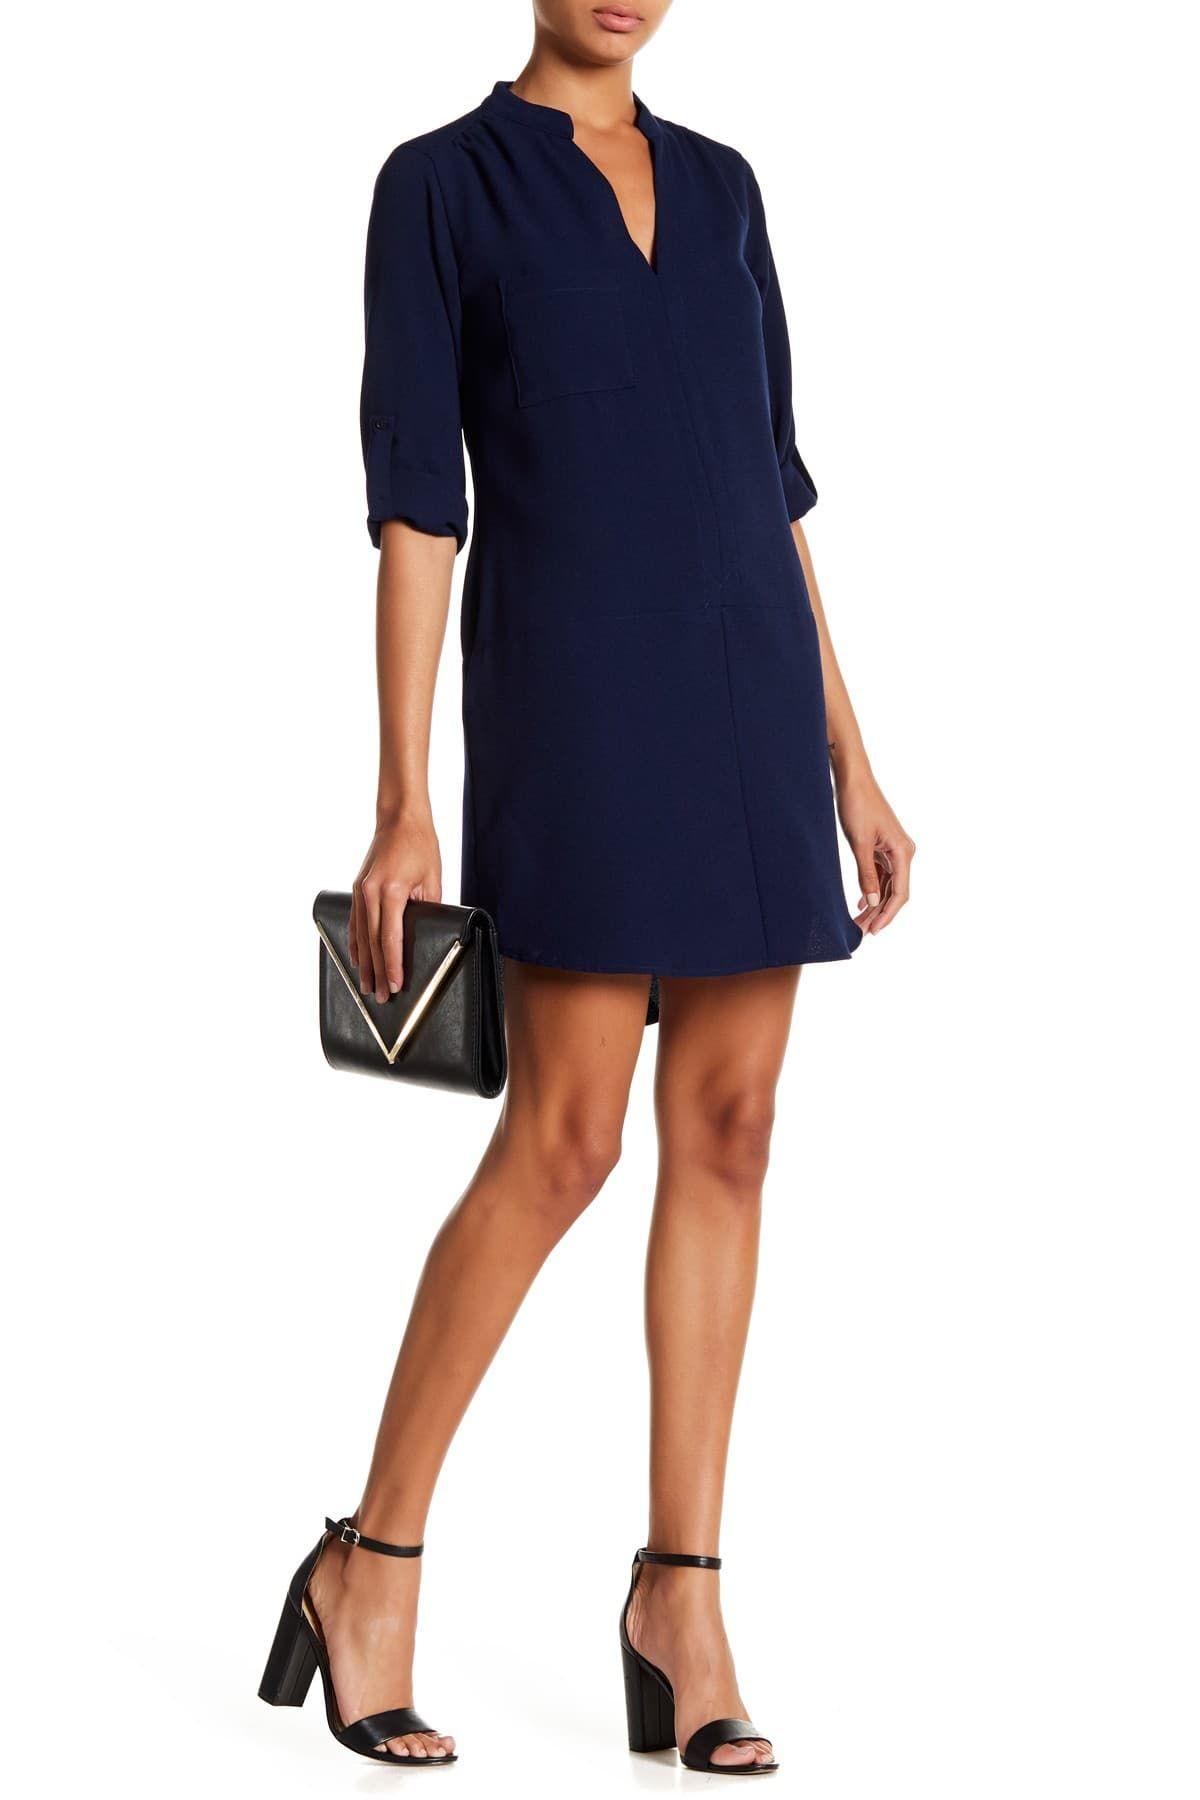 Lush Novak 3 4 Sleeve Shift Dress Nordstrom Rack In 2021 Shift Dress Casual Work Dresses Classic Shirt Dress [ 1800 x 1200 Pixel ]